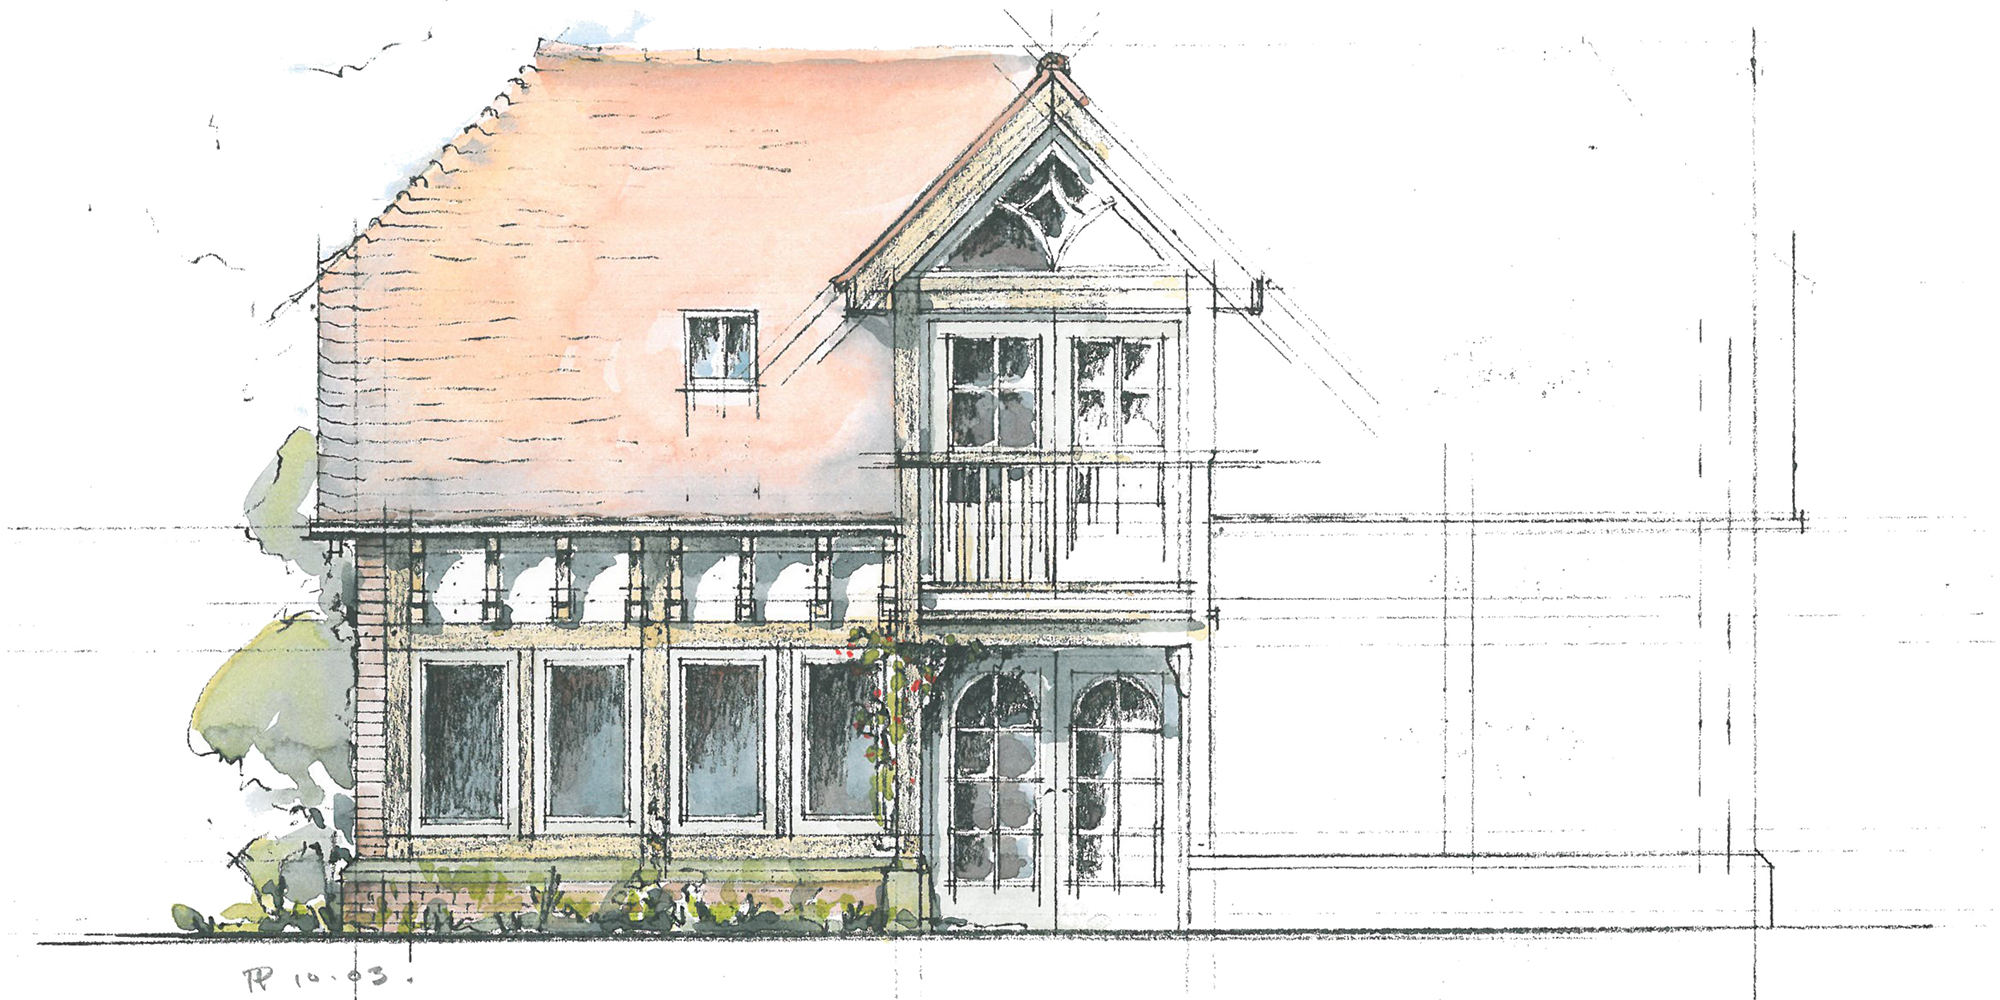 Project design studio ltd woburn for Design house architecture ltd